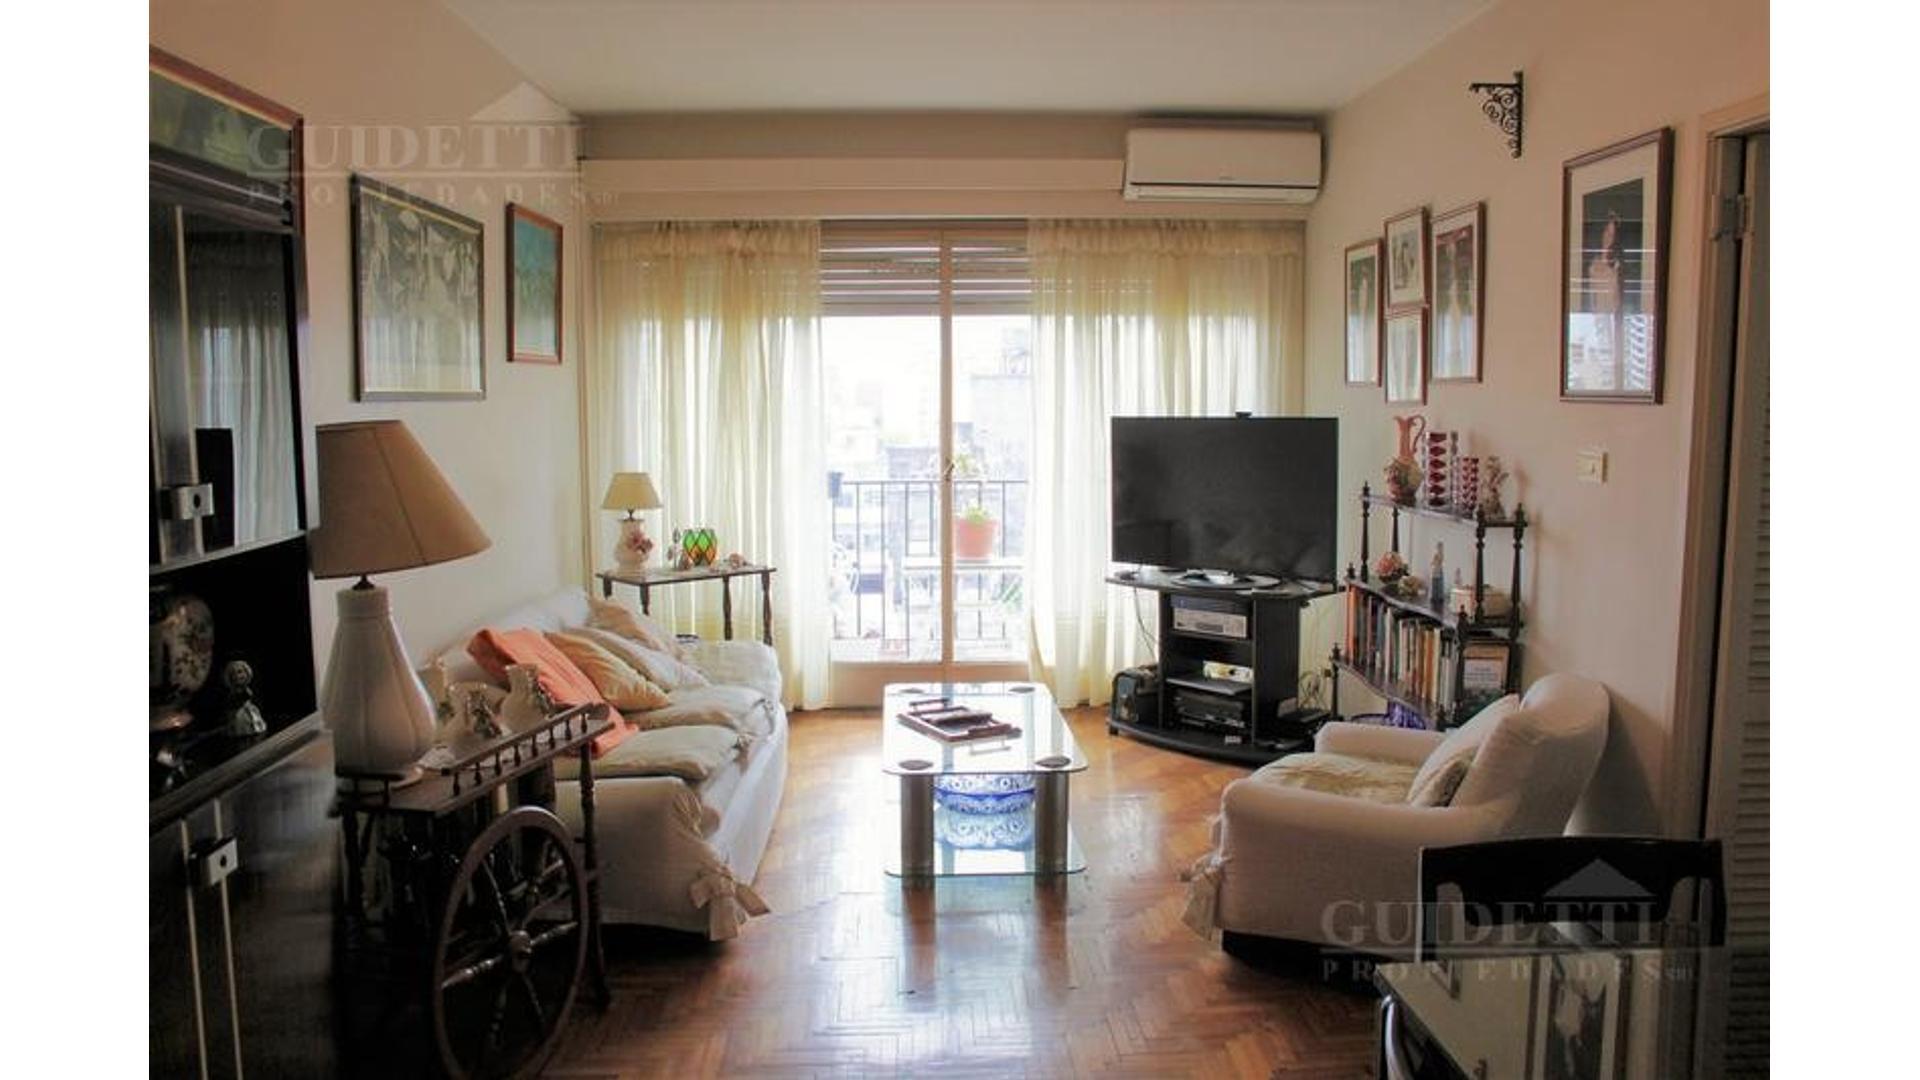 Venta departamentos  4 ambientes balcón al frente  avenida  Rivadavia en Floresta